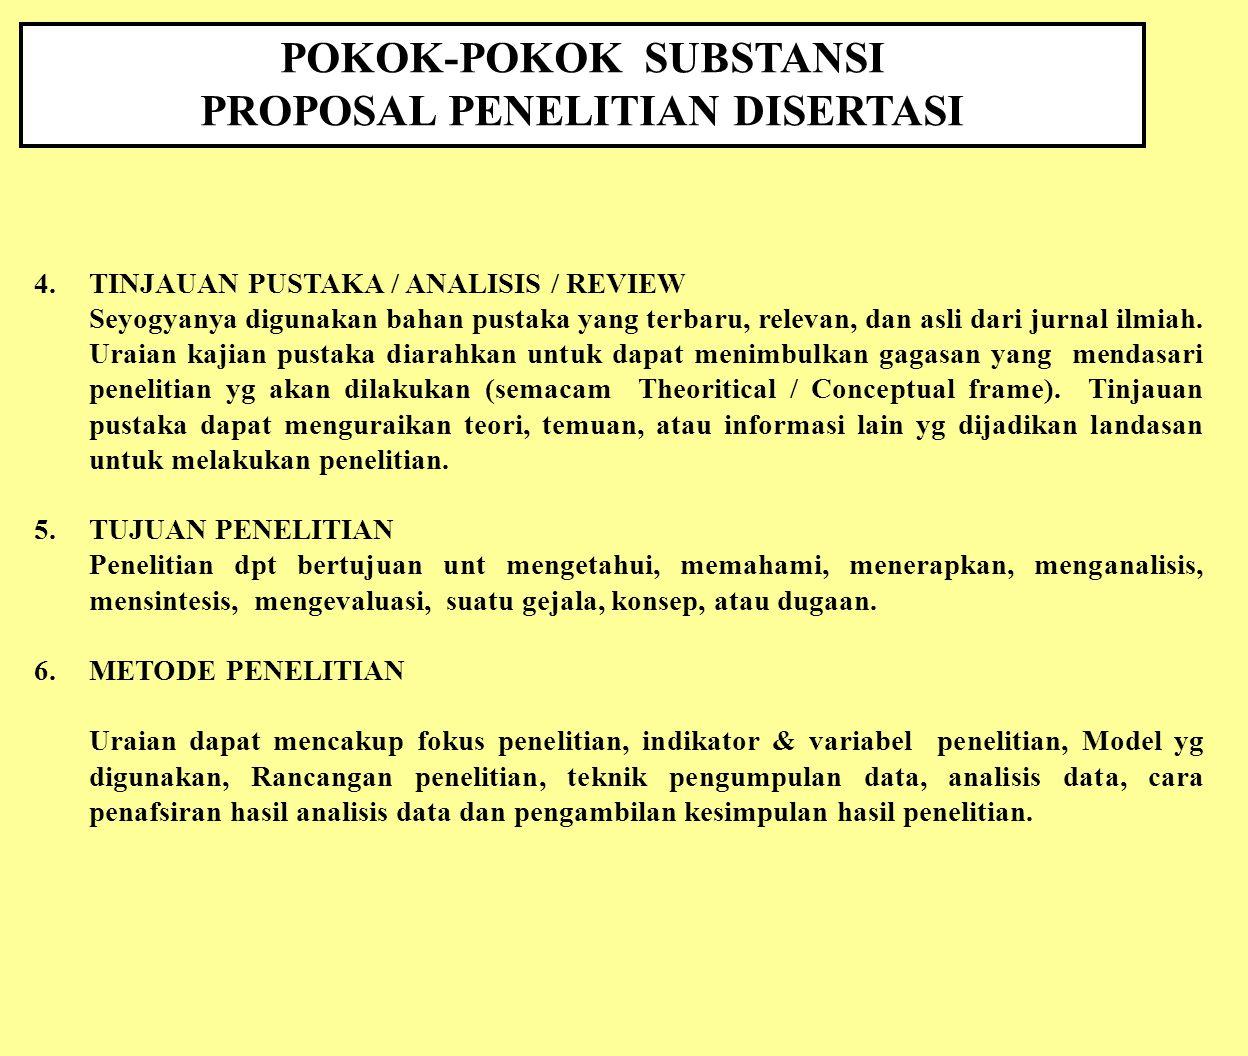 POKOK-POKOK SUBSTANSI PROPOSAL PENELITIAN DISERTASI 4.TINJAUAN PUSTAKA / ANALISIS / REVIEW Seyogyanya digunakan bahan pustaka yang terbaru, relevan, d